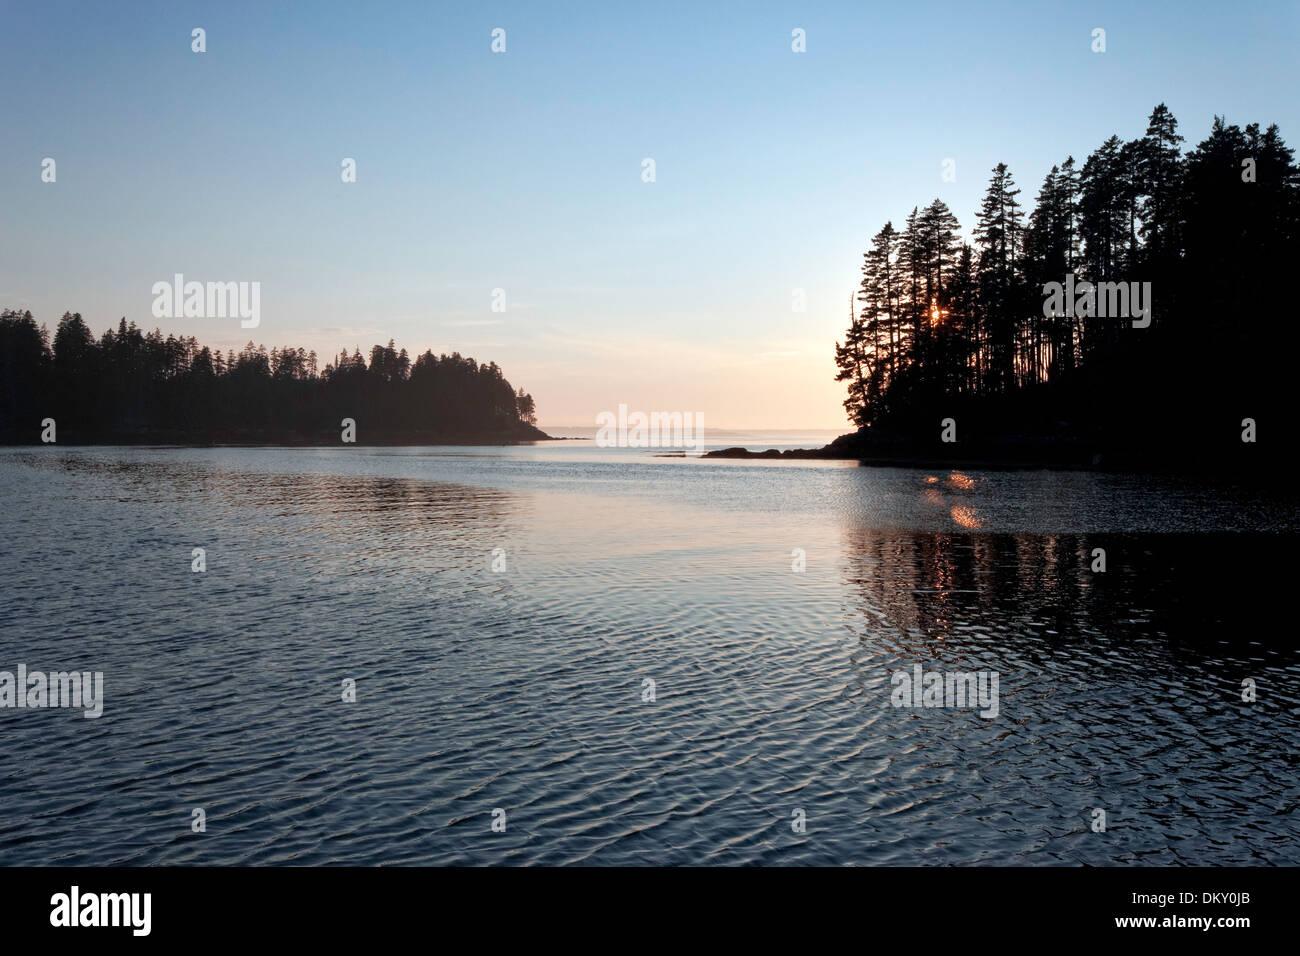 Scenic Maine, Roque Island Archipelago, Down East, Maine - Stock Image